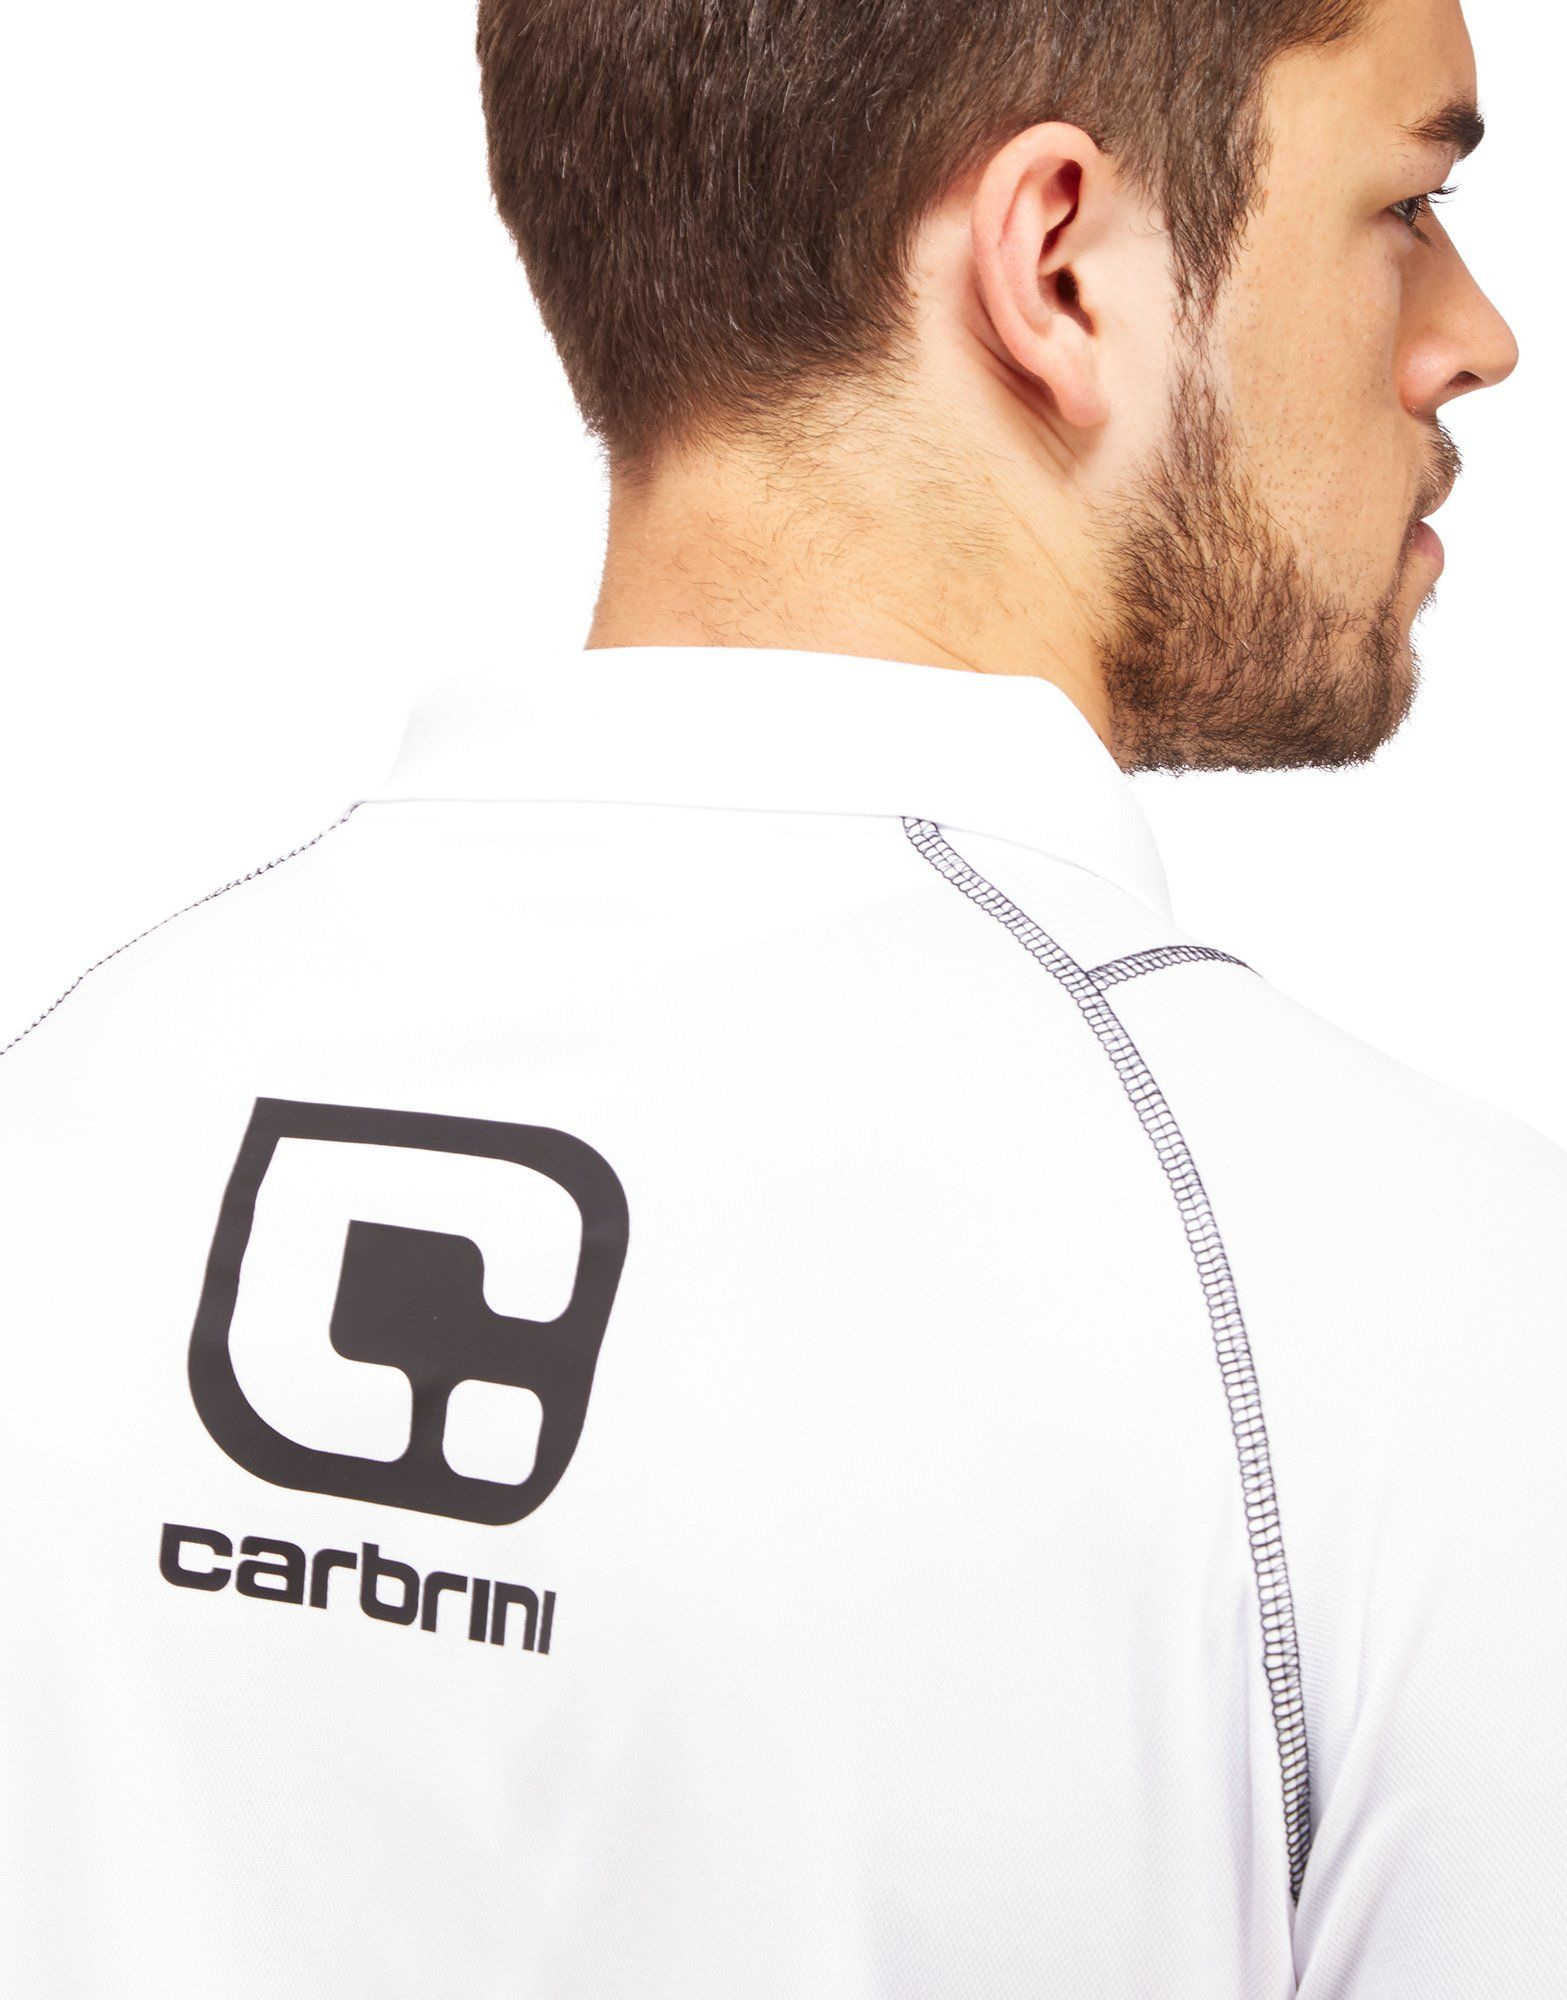 Carbrini Inverness CT Polo Shirt